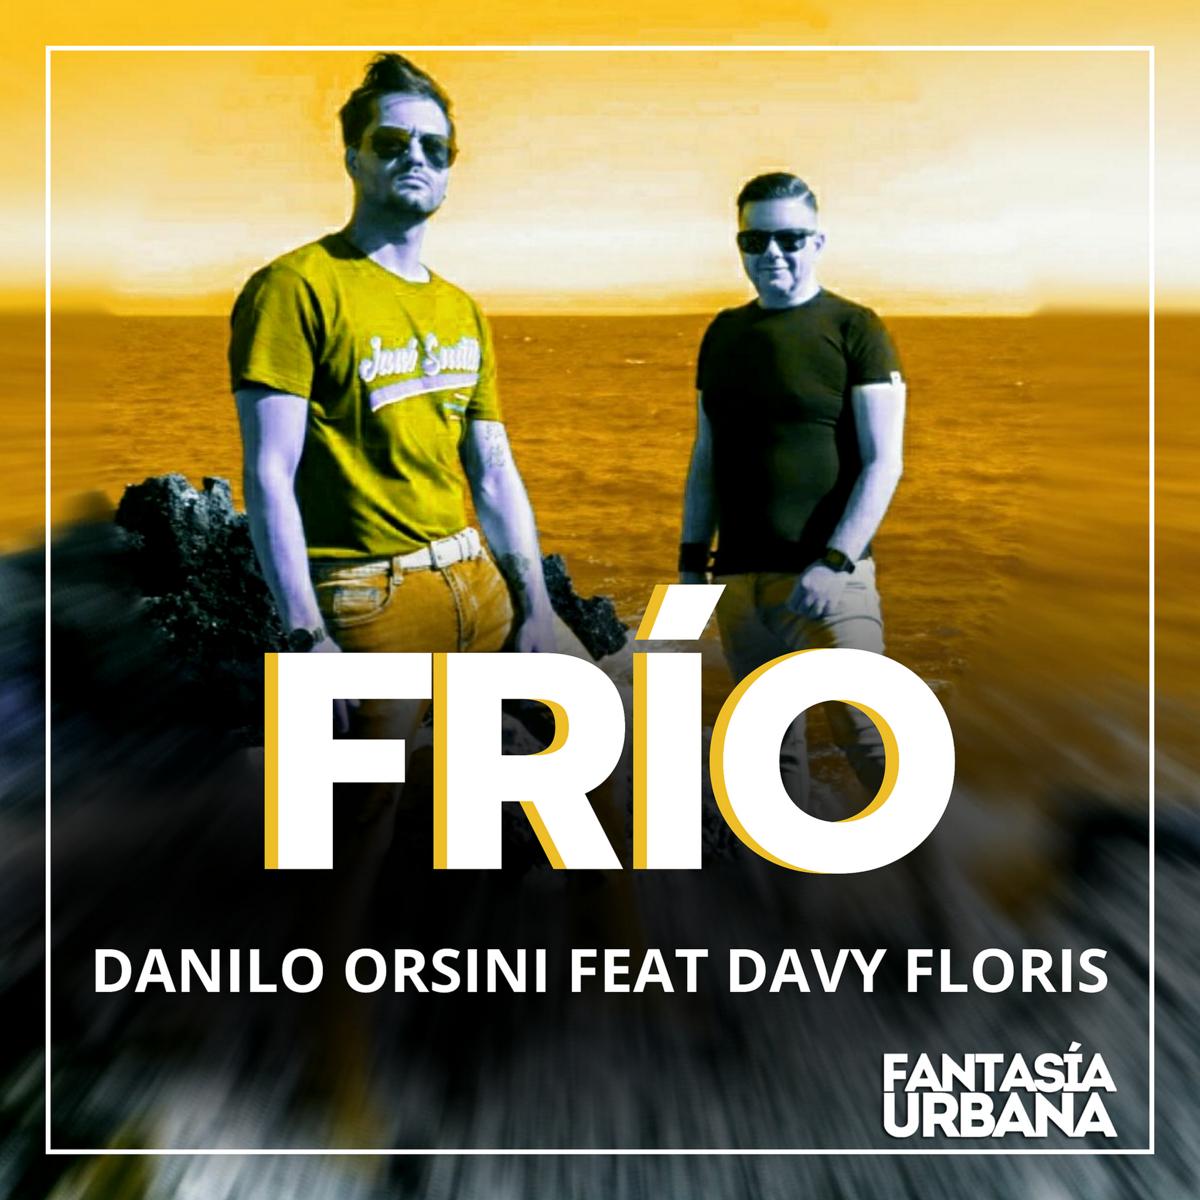 "Danilo Orsini Feat. Davy Floris lanzan su nuevo single ""Frío"""